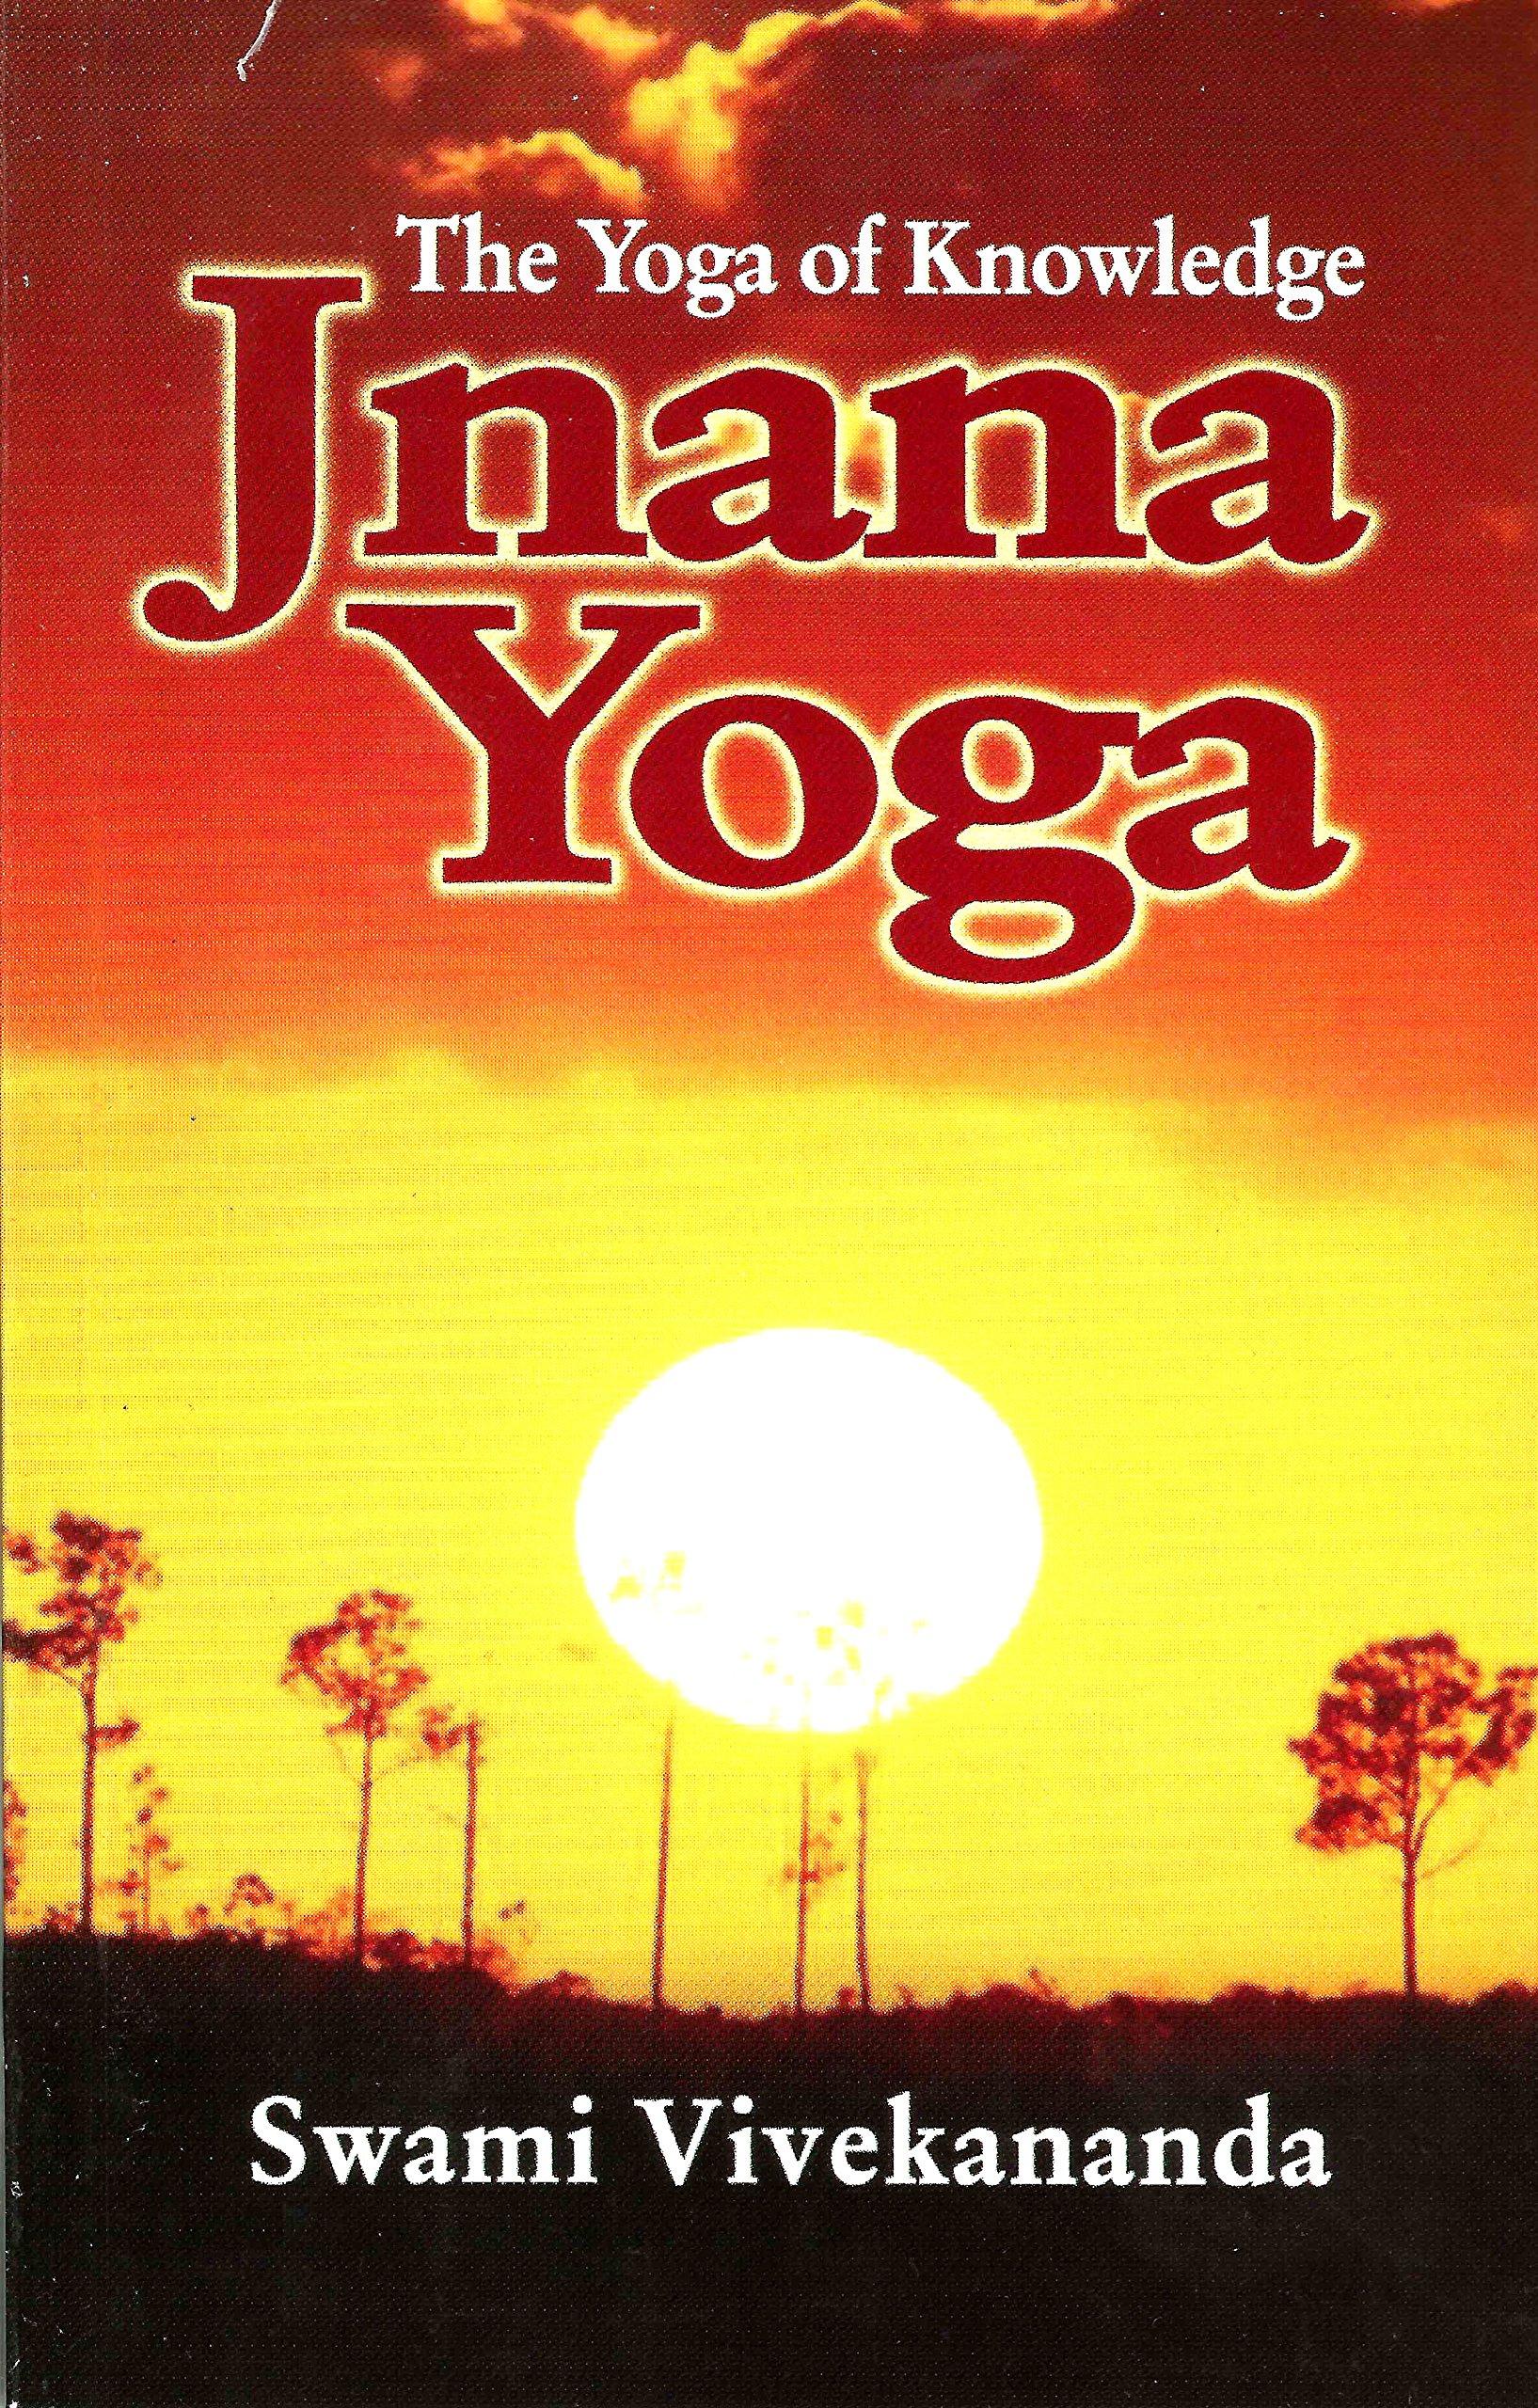 Jnana Yoga: The Yoga of Knowledge: Swami Vivekananda, Swami ...